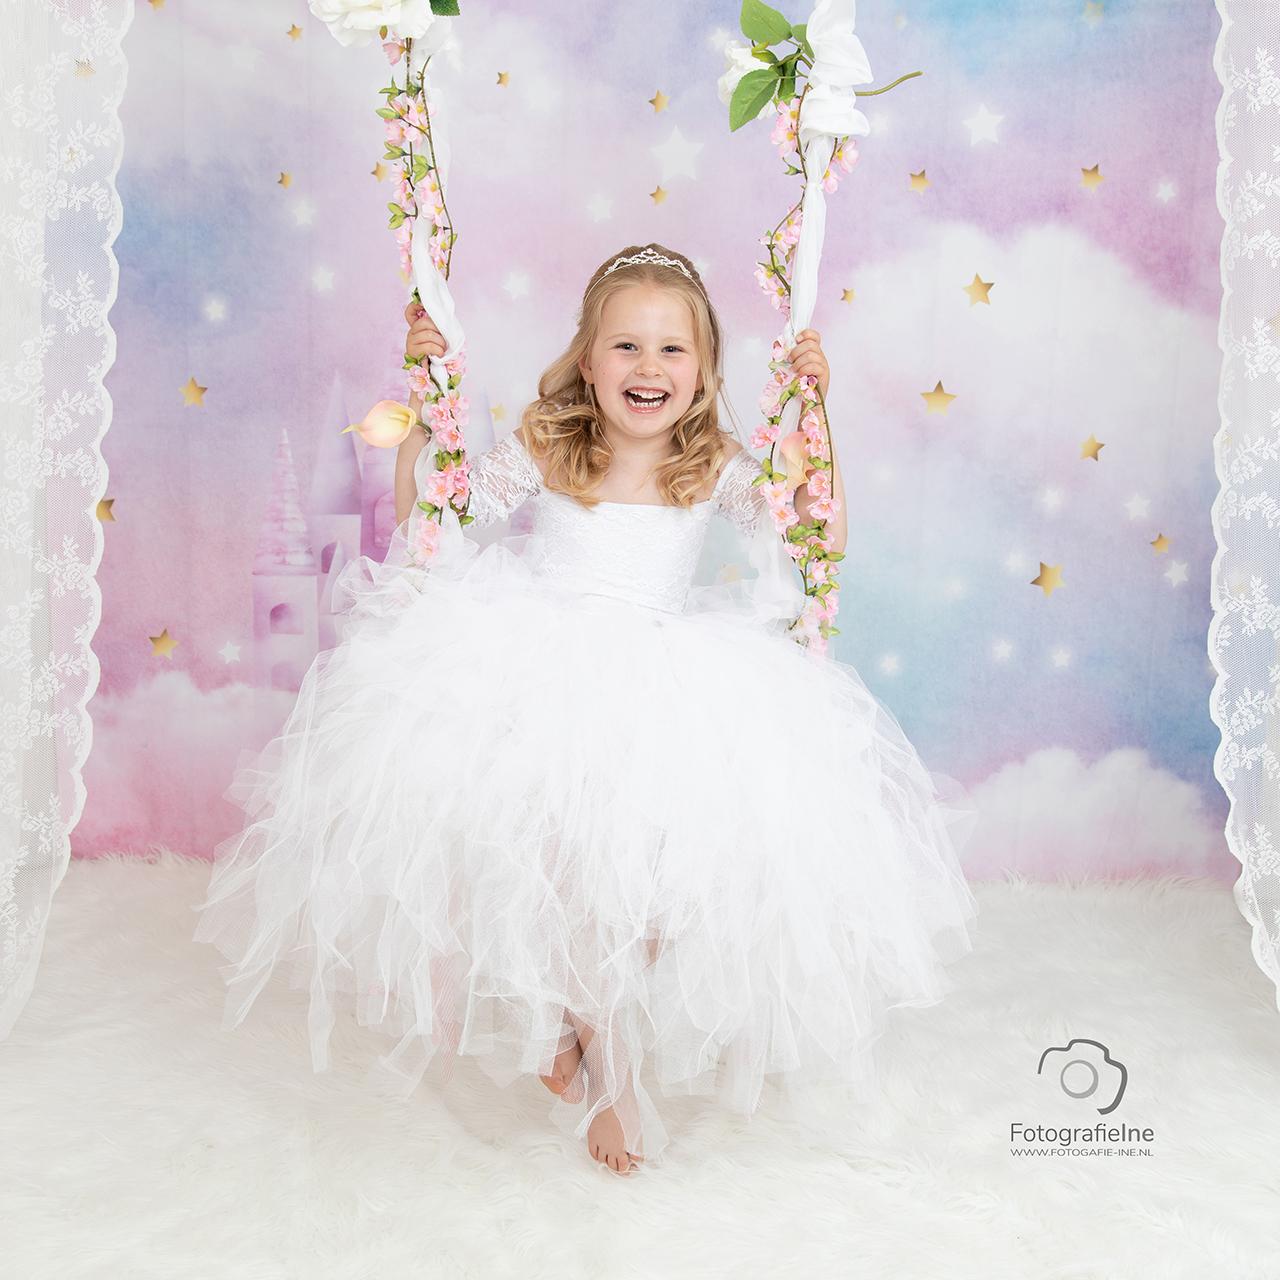 Fotografie Ine Prinsessen fotoshoot prinses